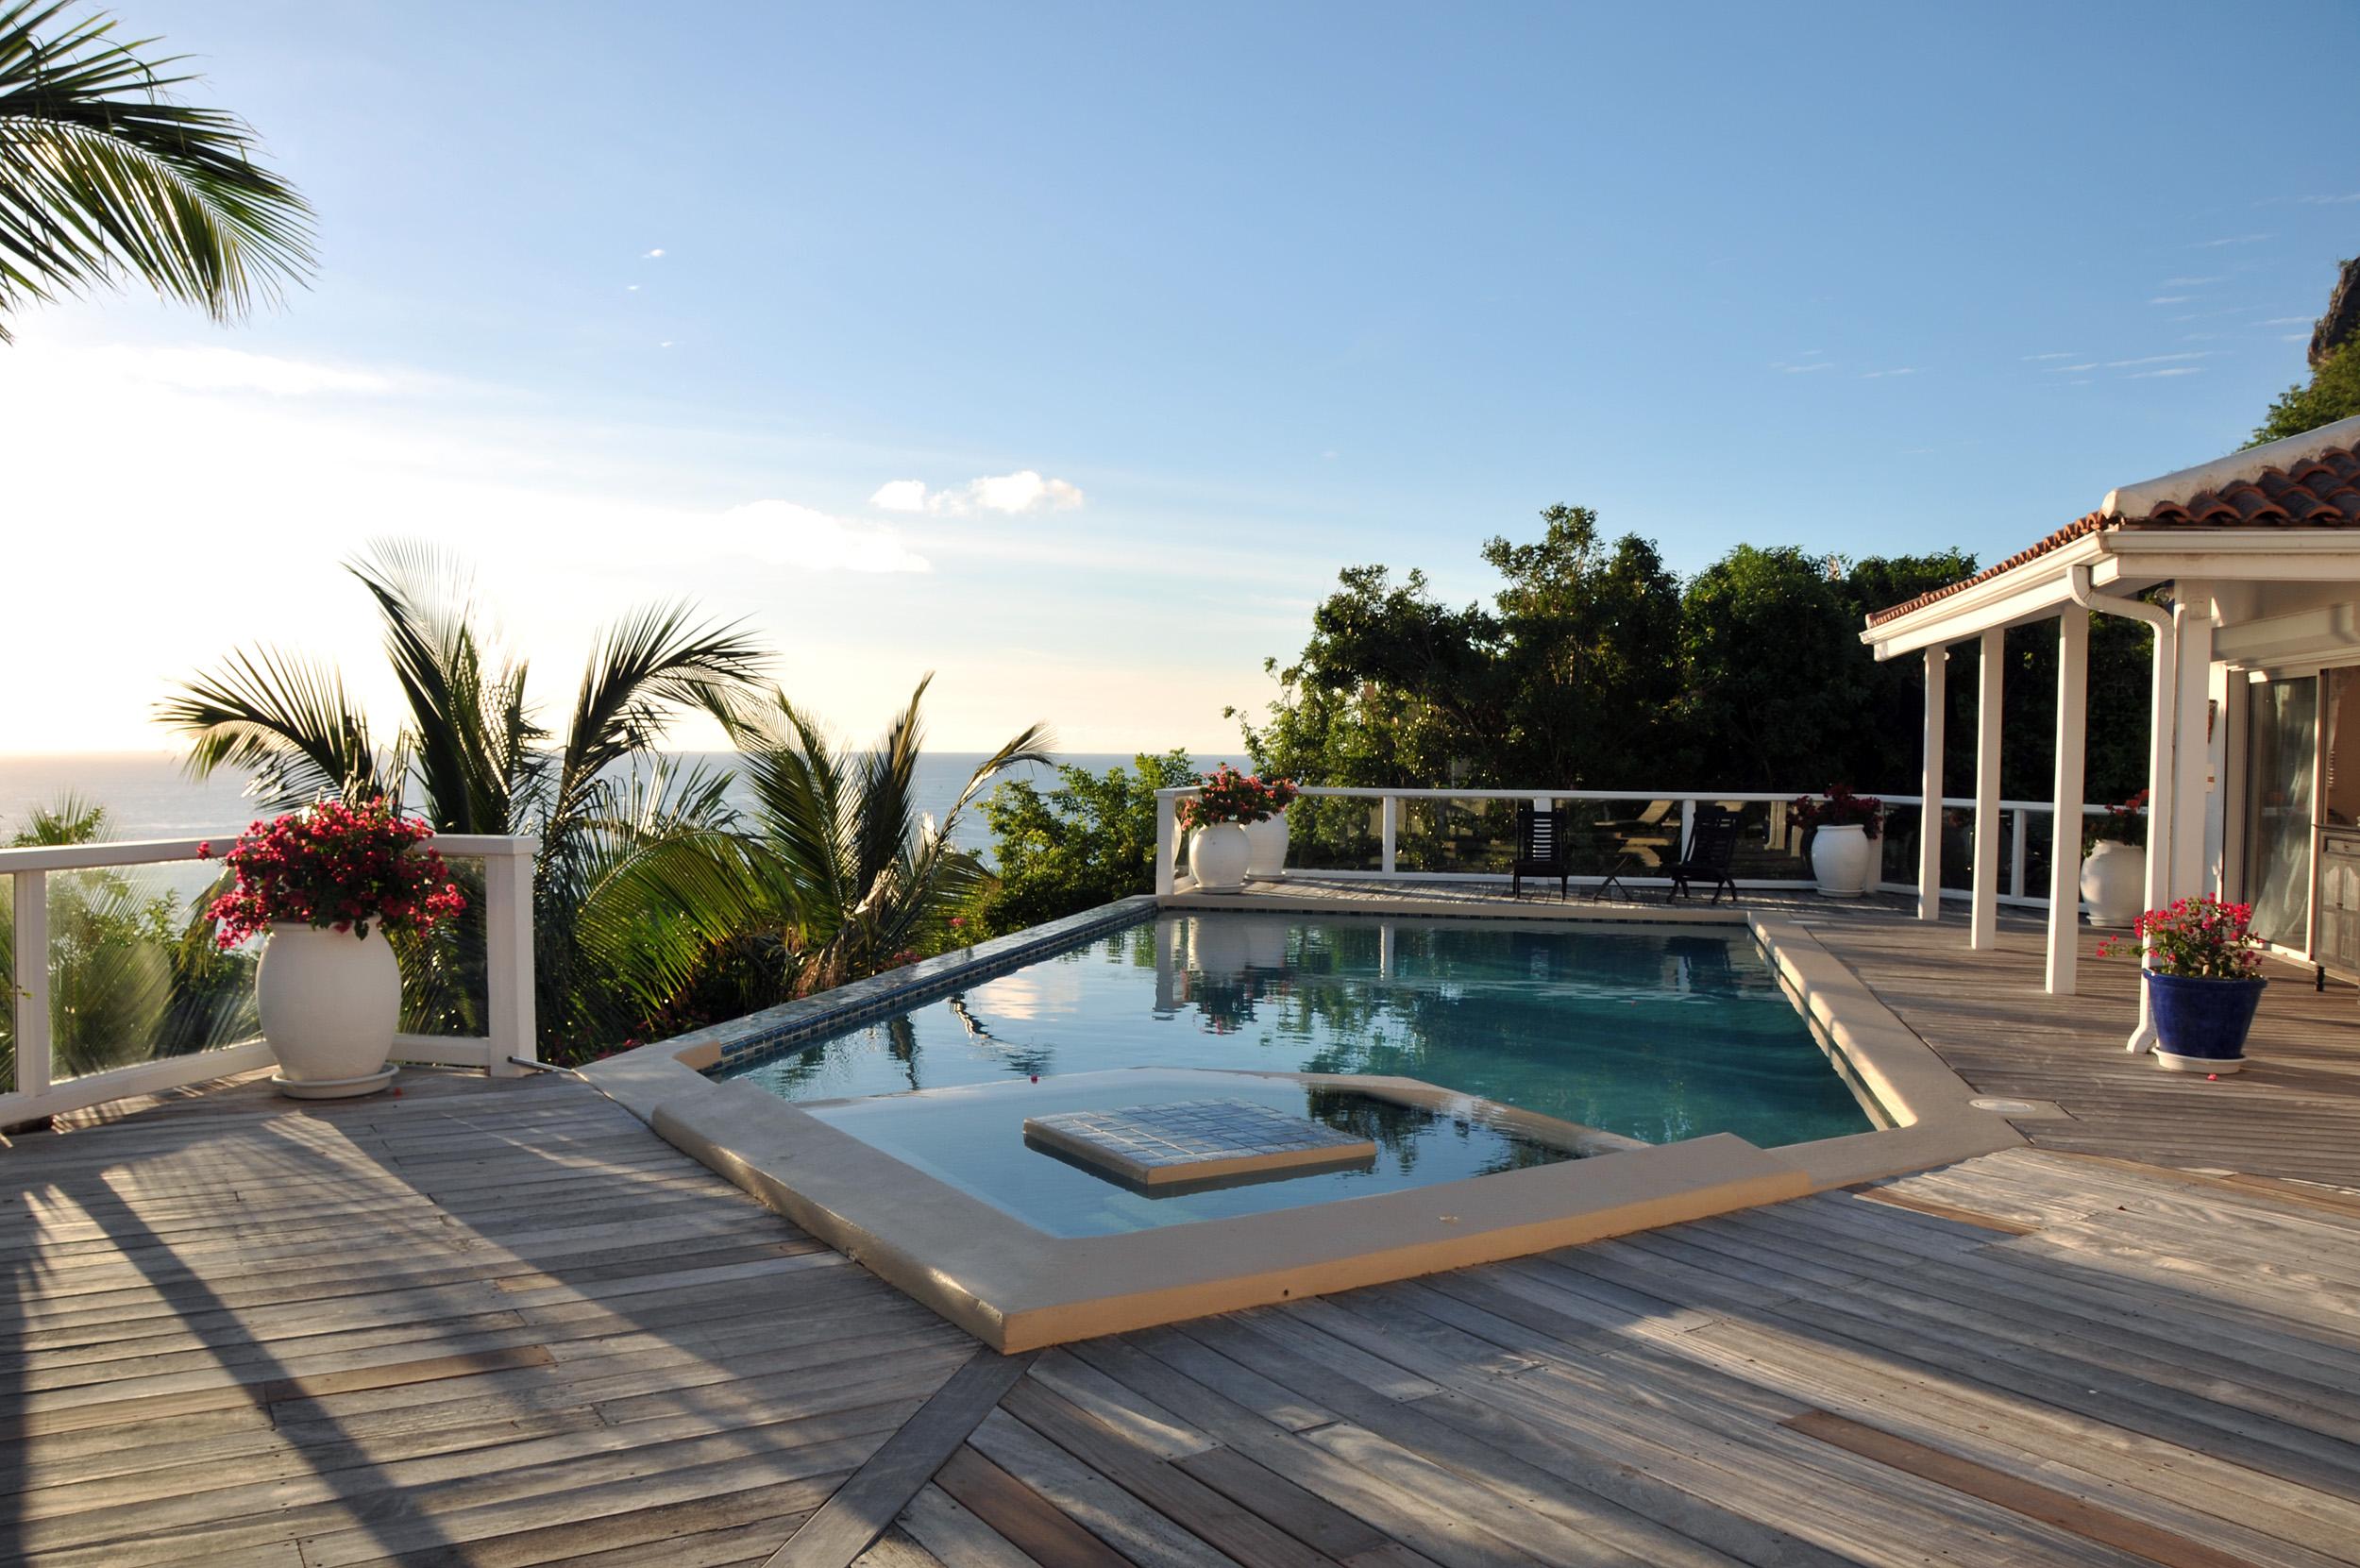 SM405 Pool + Deck